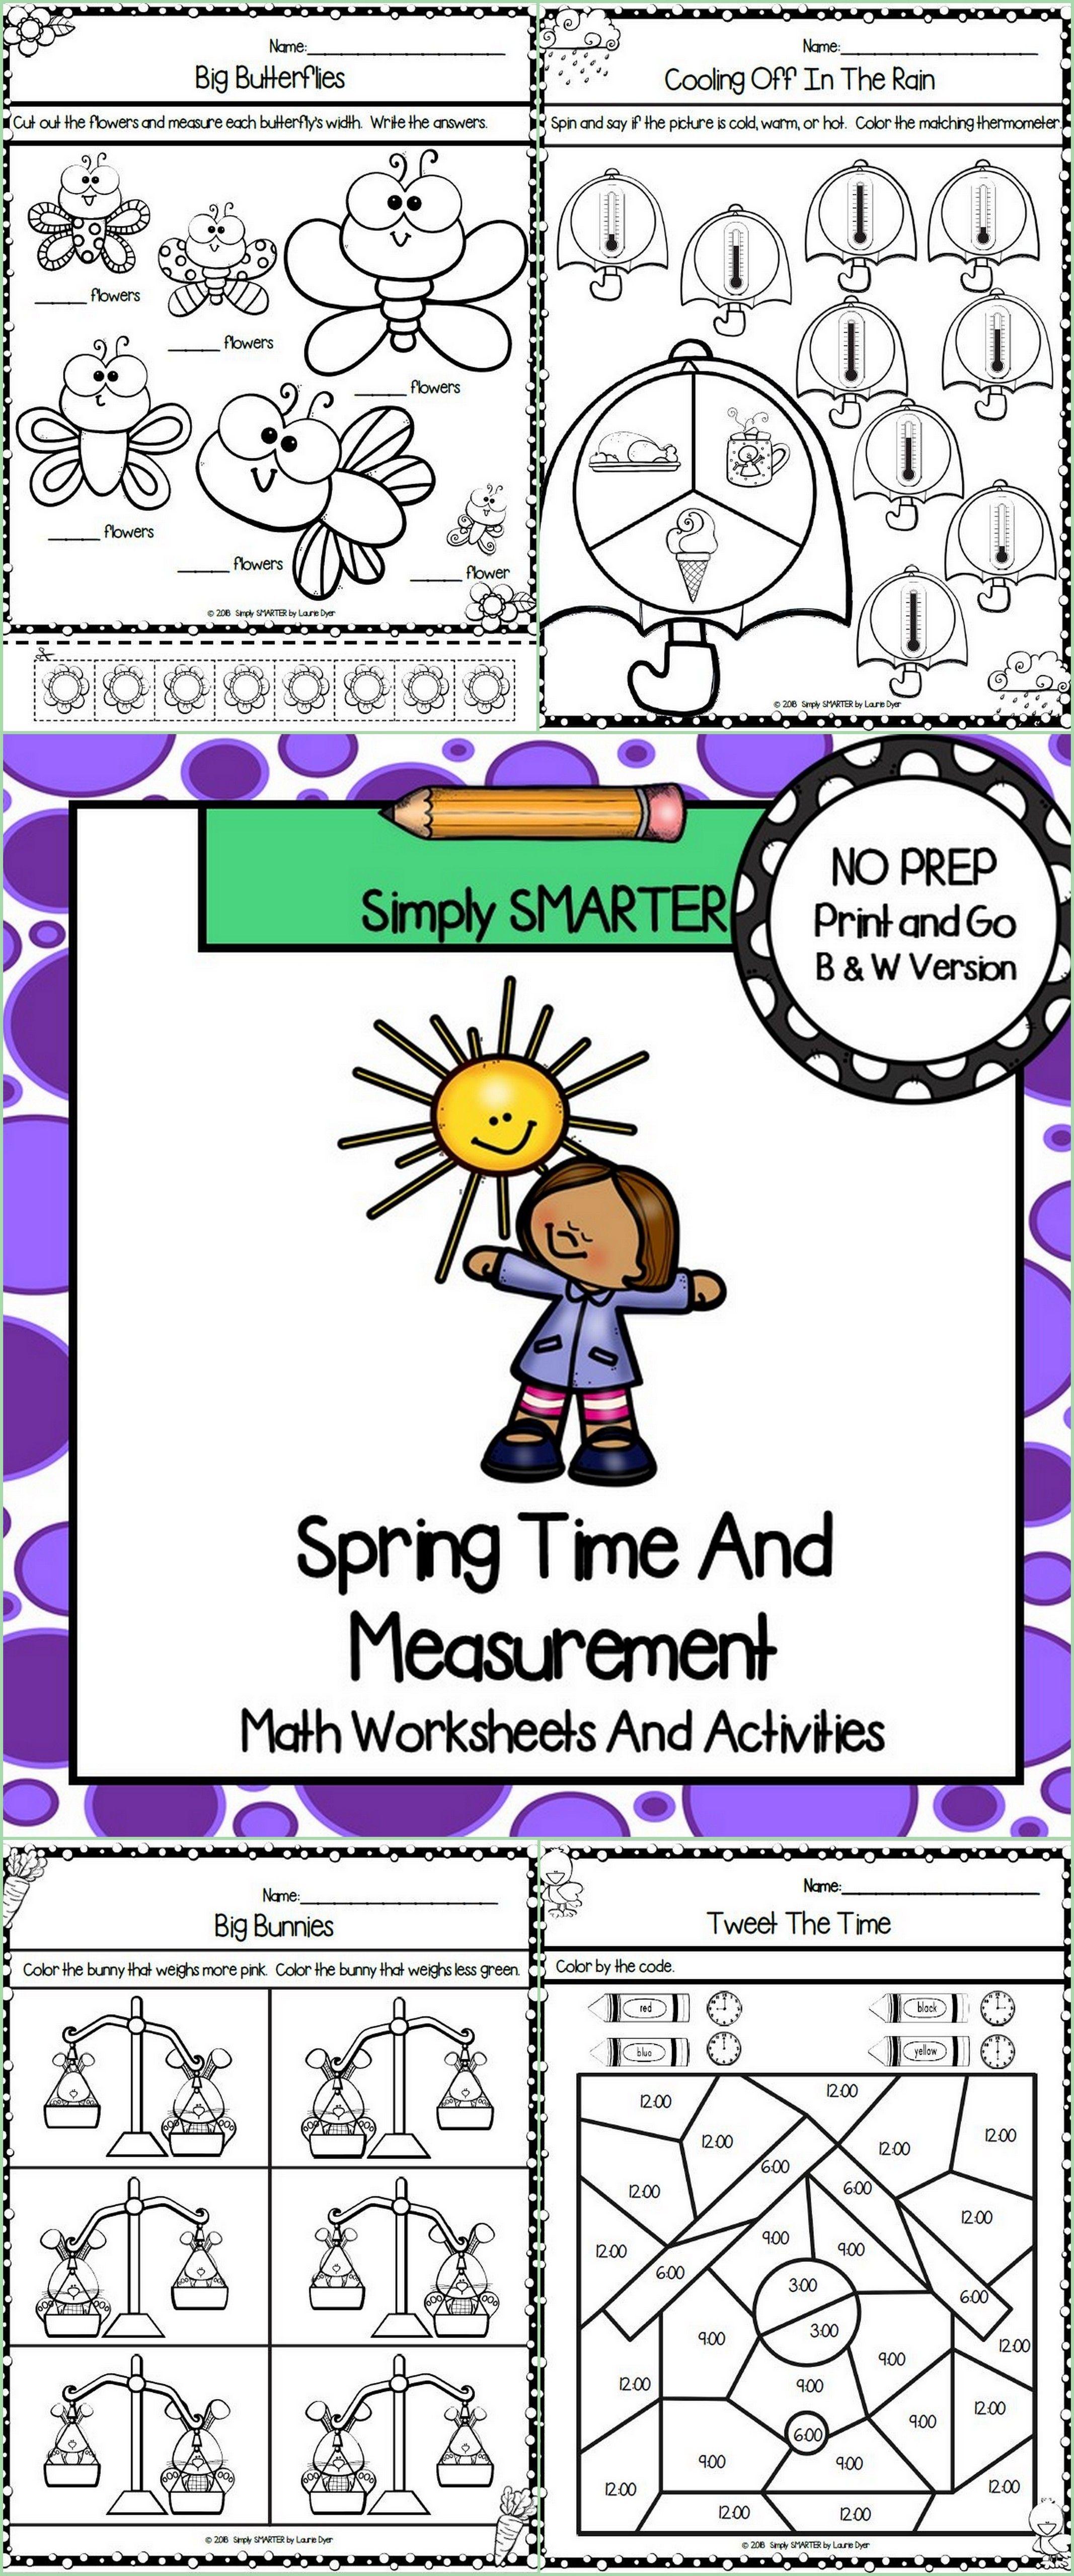 Are You Looking For No Prep Math Activities For Preschool Kindergarten Or First Grade Then Enjoy This Resource Math Measurement Measurement Worksheets Math [ 5120 x 2134 Pixel ]